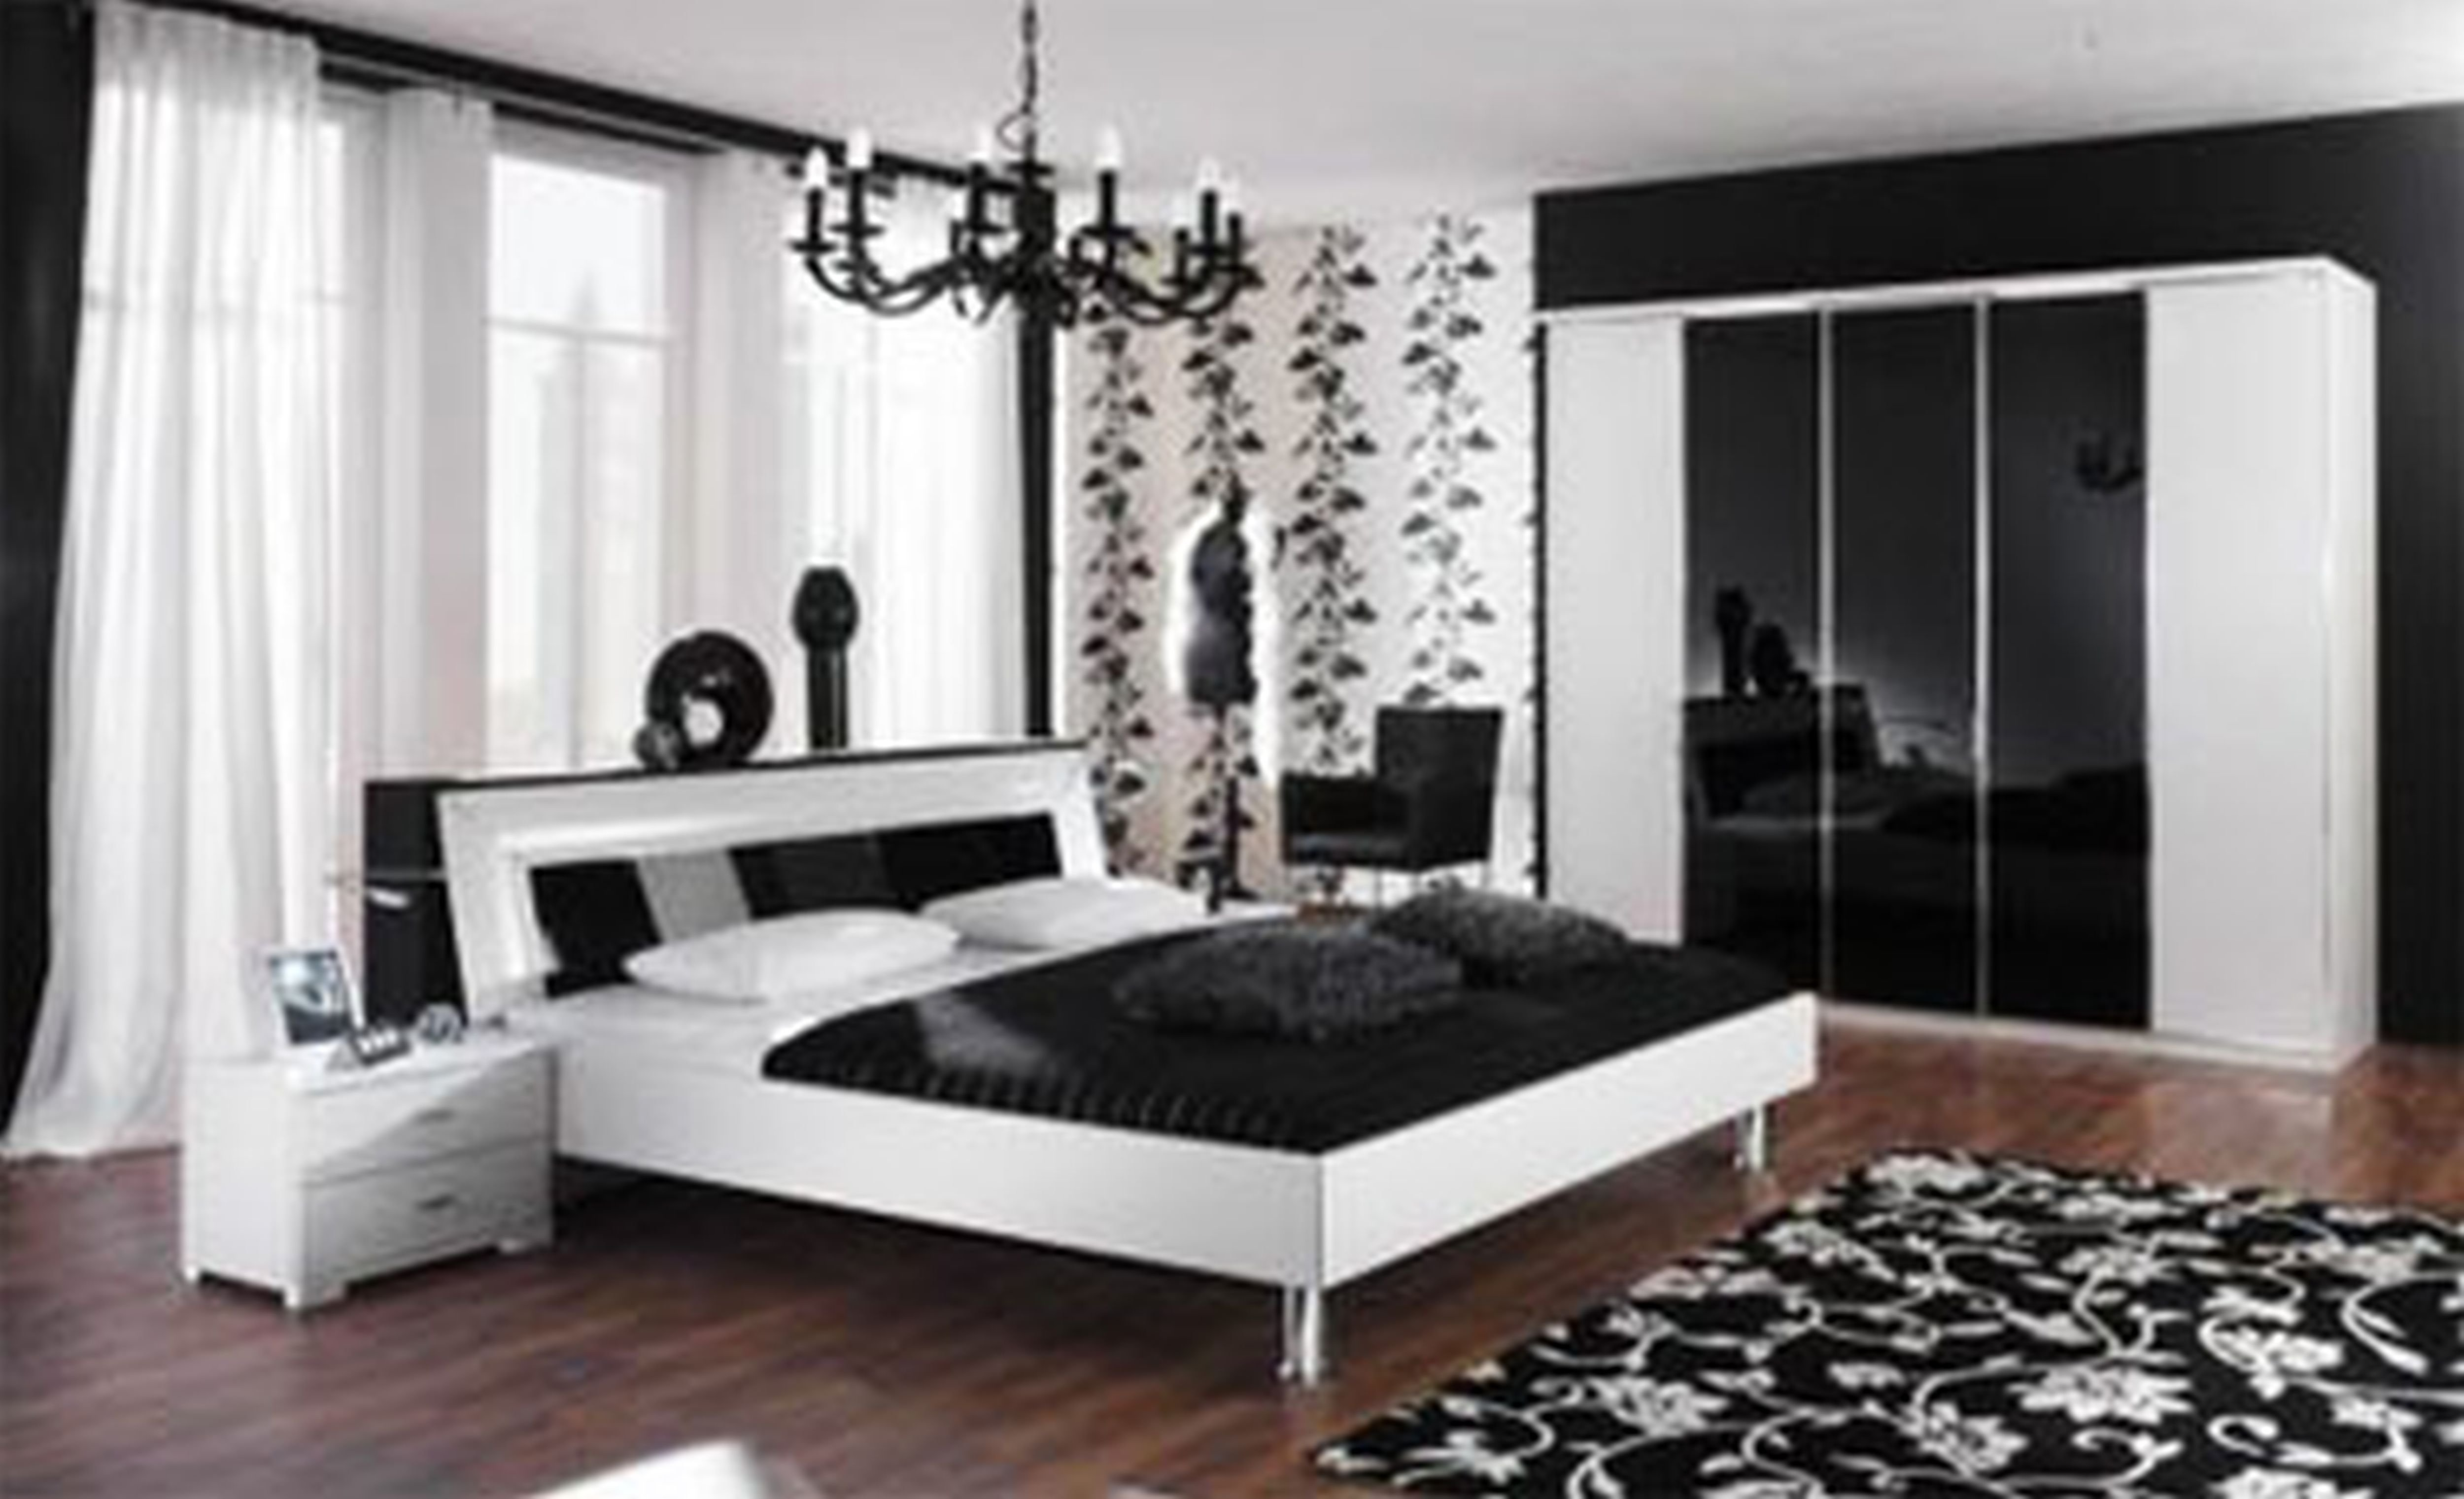 10 Wonderful Black And White Bedroom Ideas pictures of black and white bedrooms bedroom green and white bedroom 2020